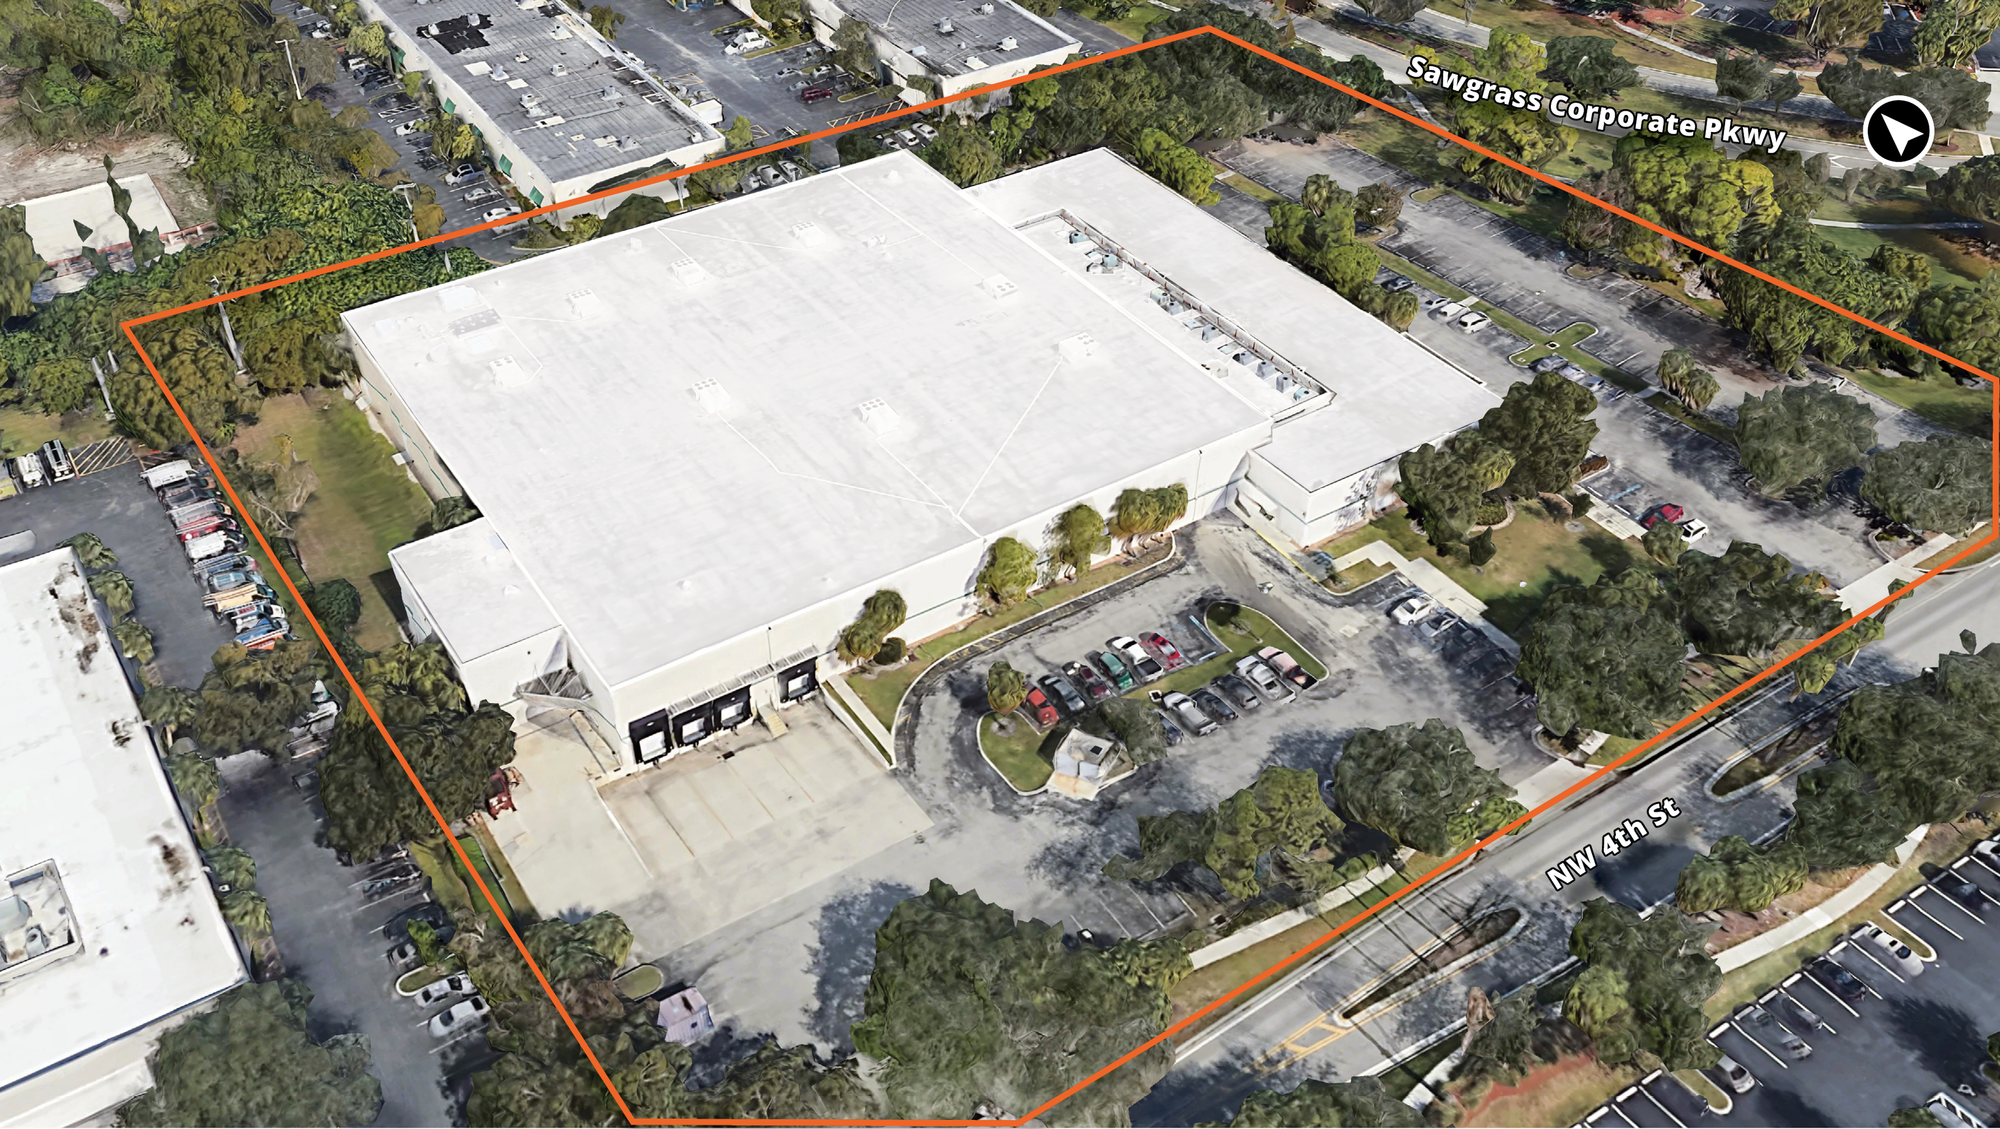 Optimum Nutrition Industrial<br/><div>403 Sawgrass Corporate Parkway</div><div>Sunrise, FL 33325</div>